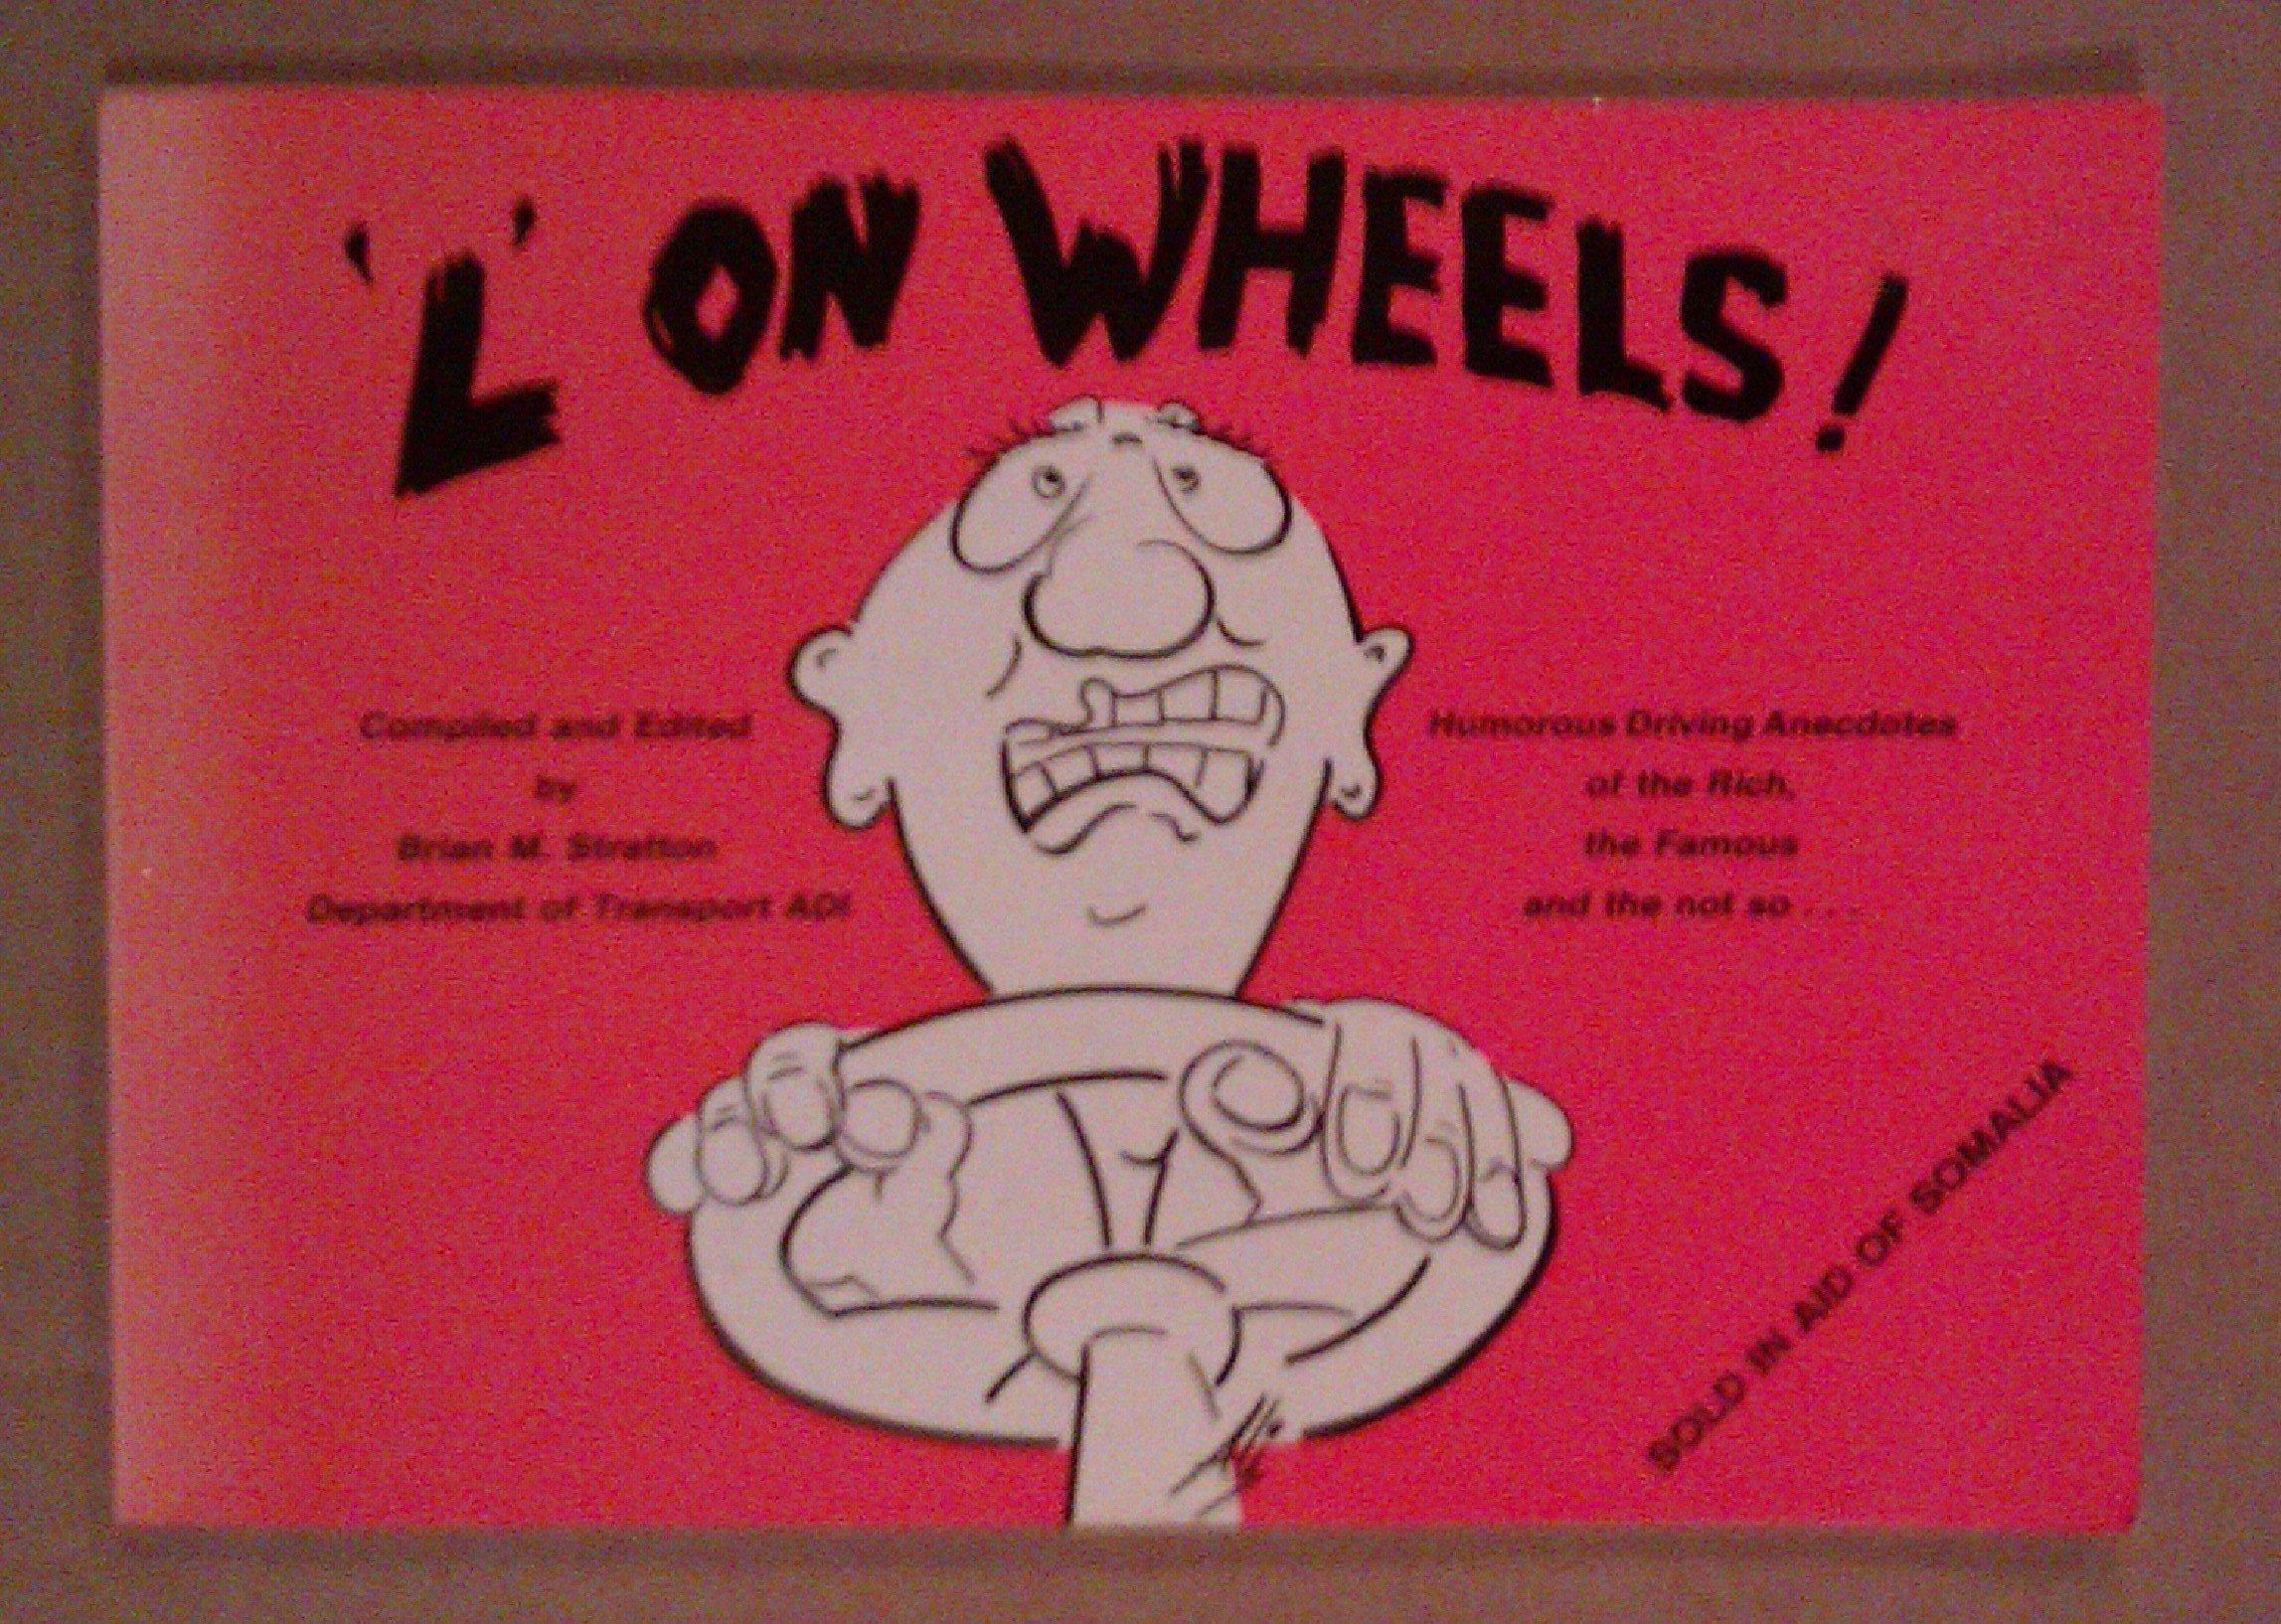 'L' on Wheels